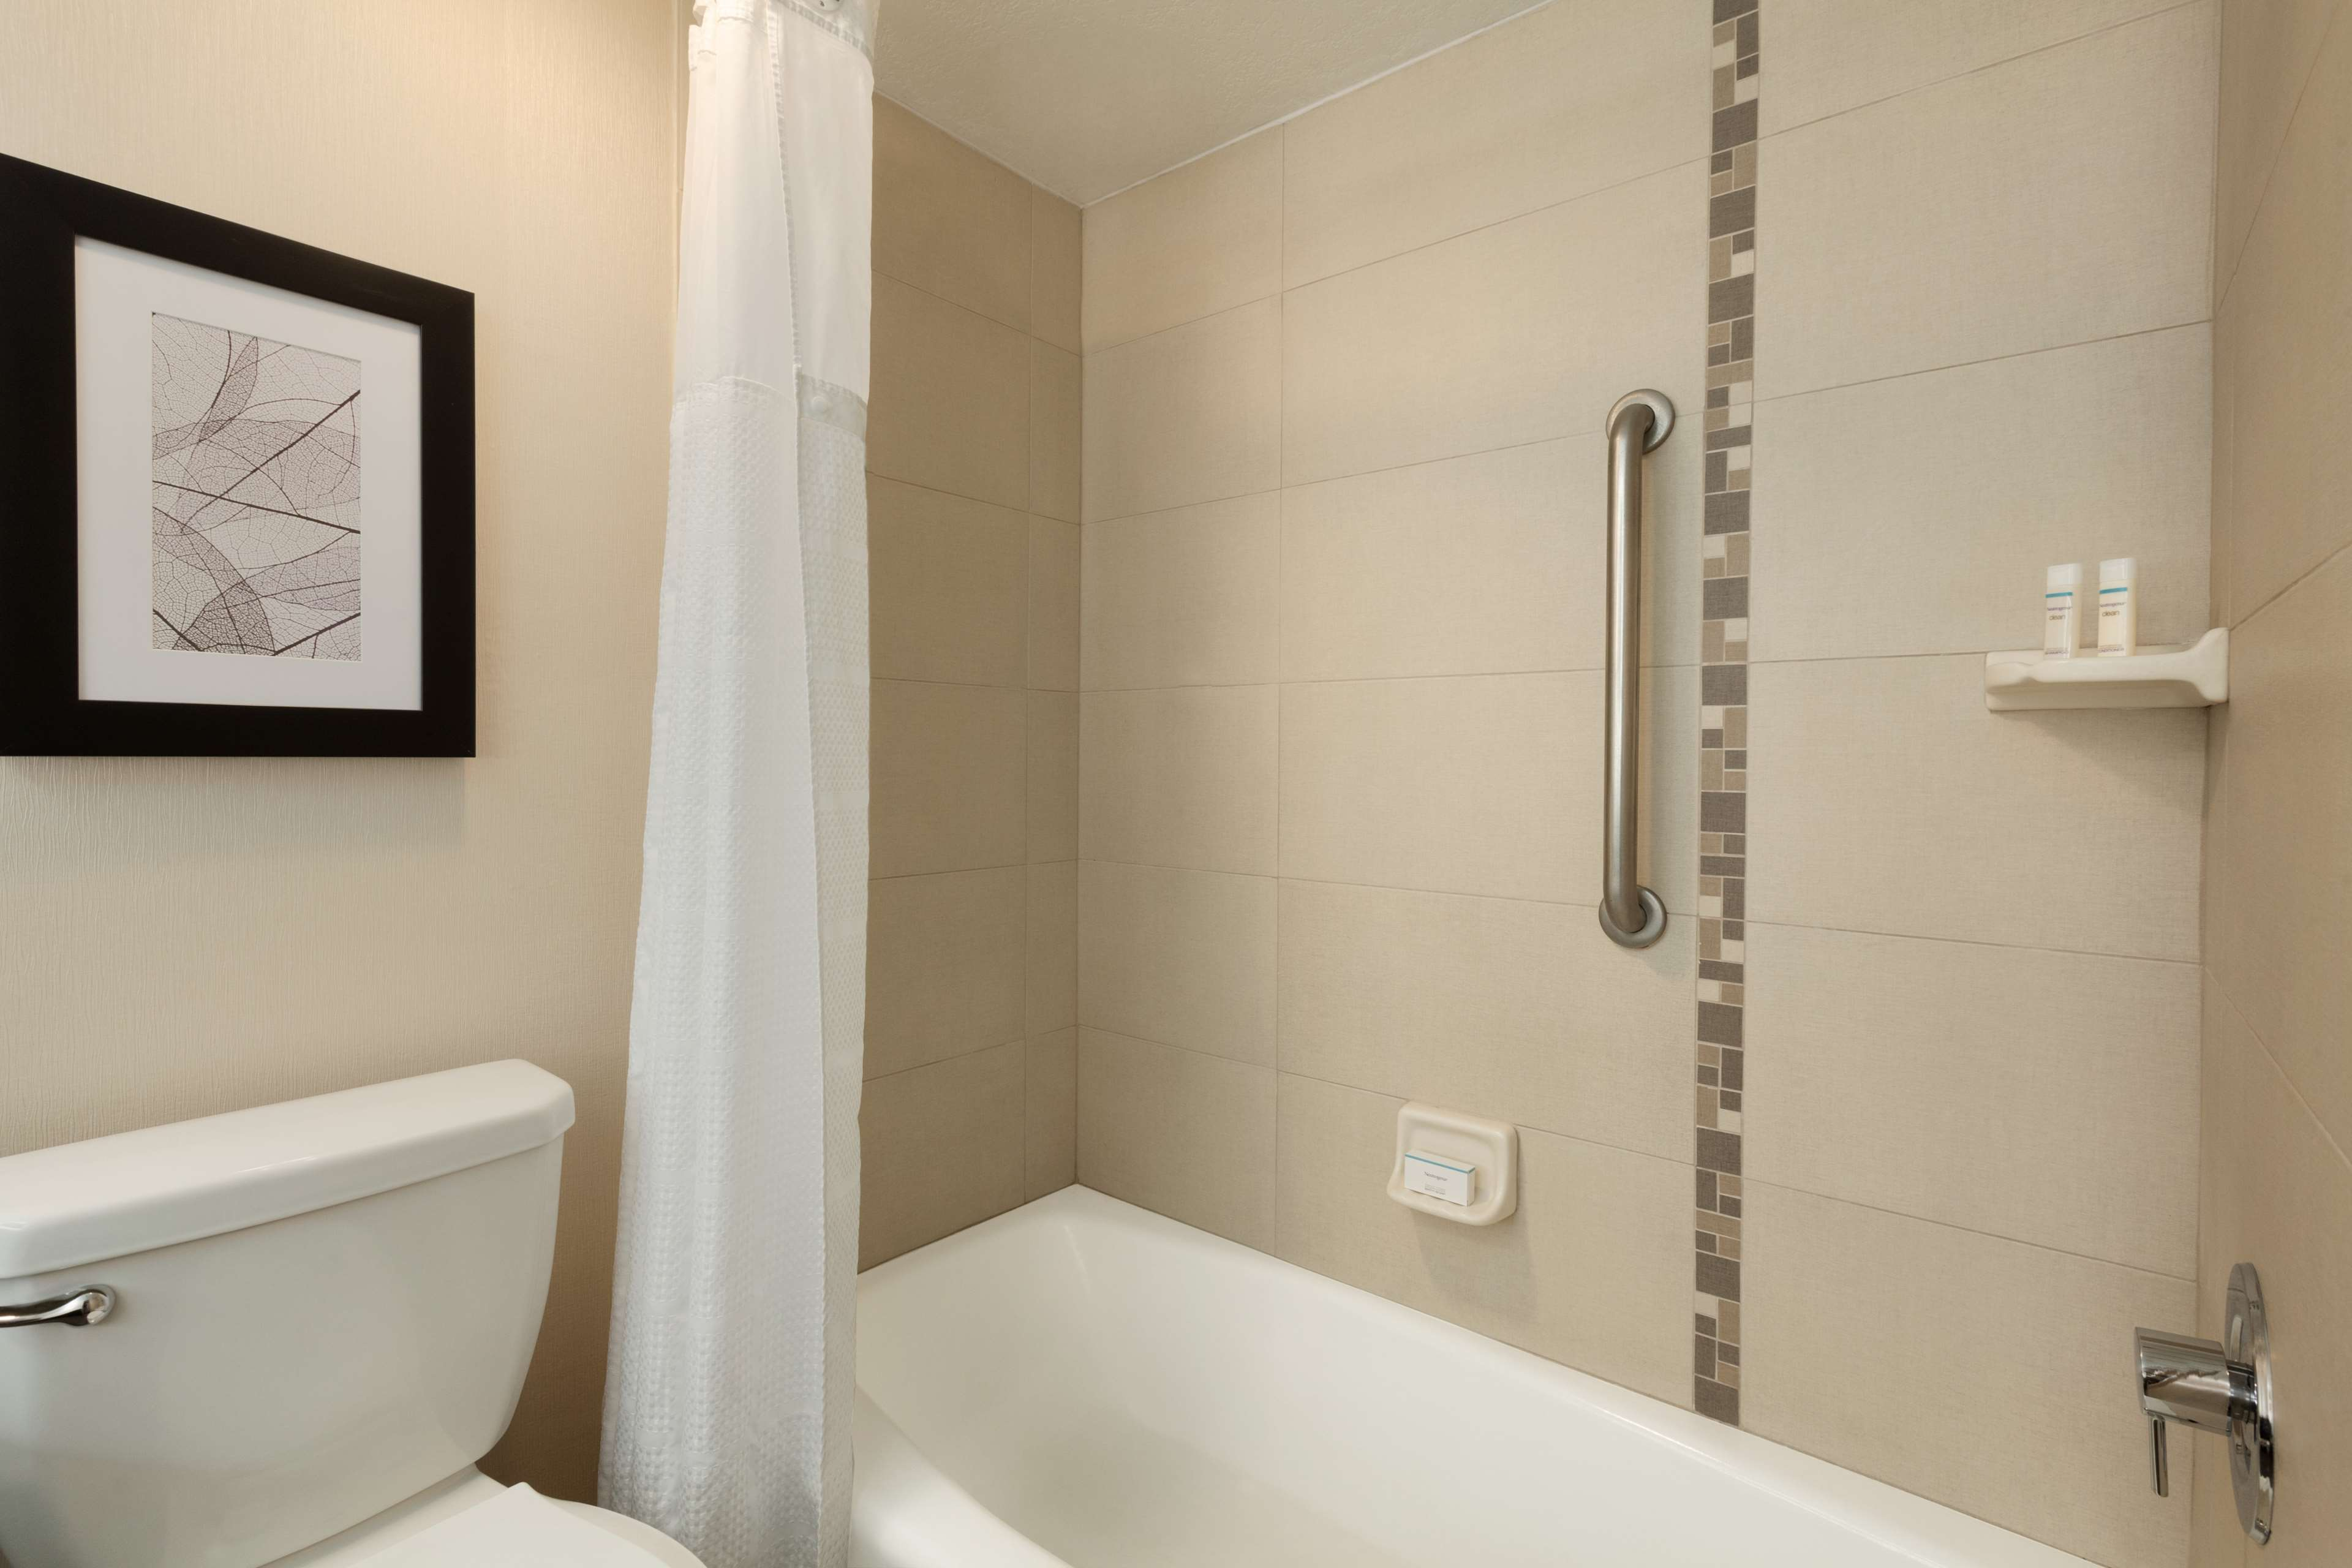 Embassy Suites by Hilton Arcadia Pasadena Area image 23